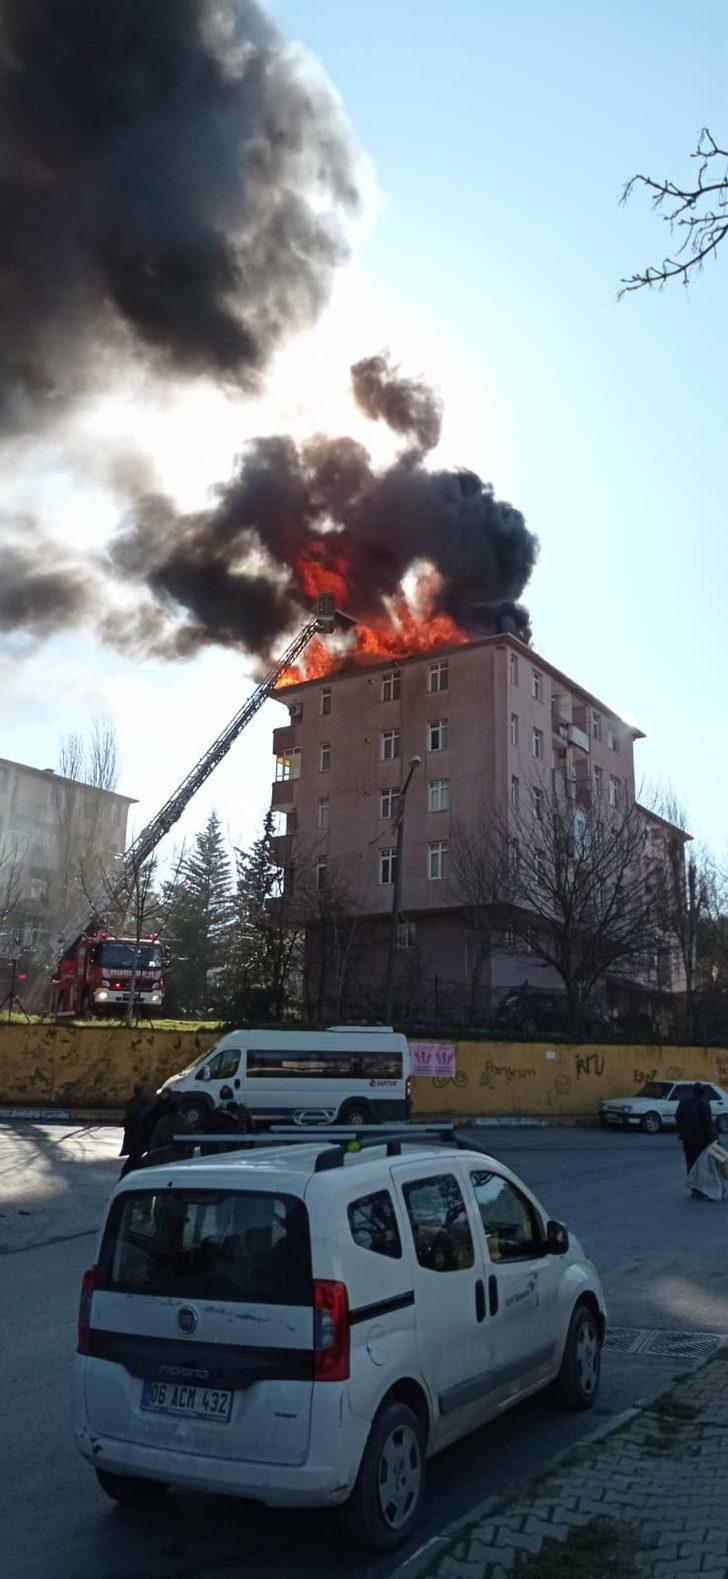 Eyüpsultan'da binanın çatısı alev alev yandı